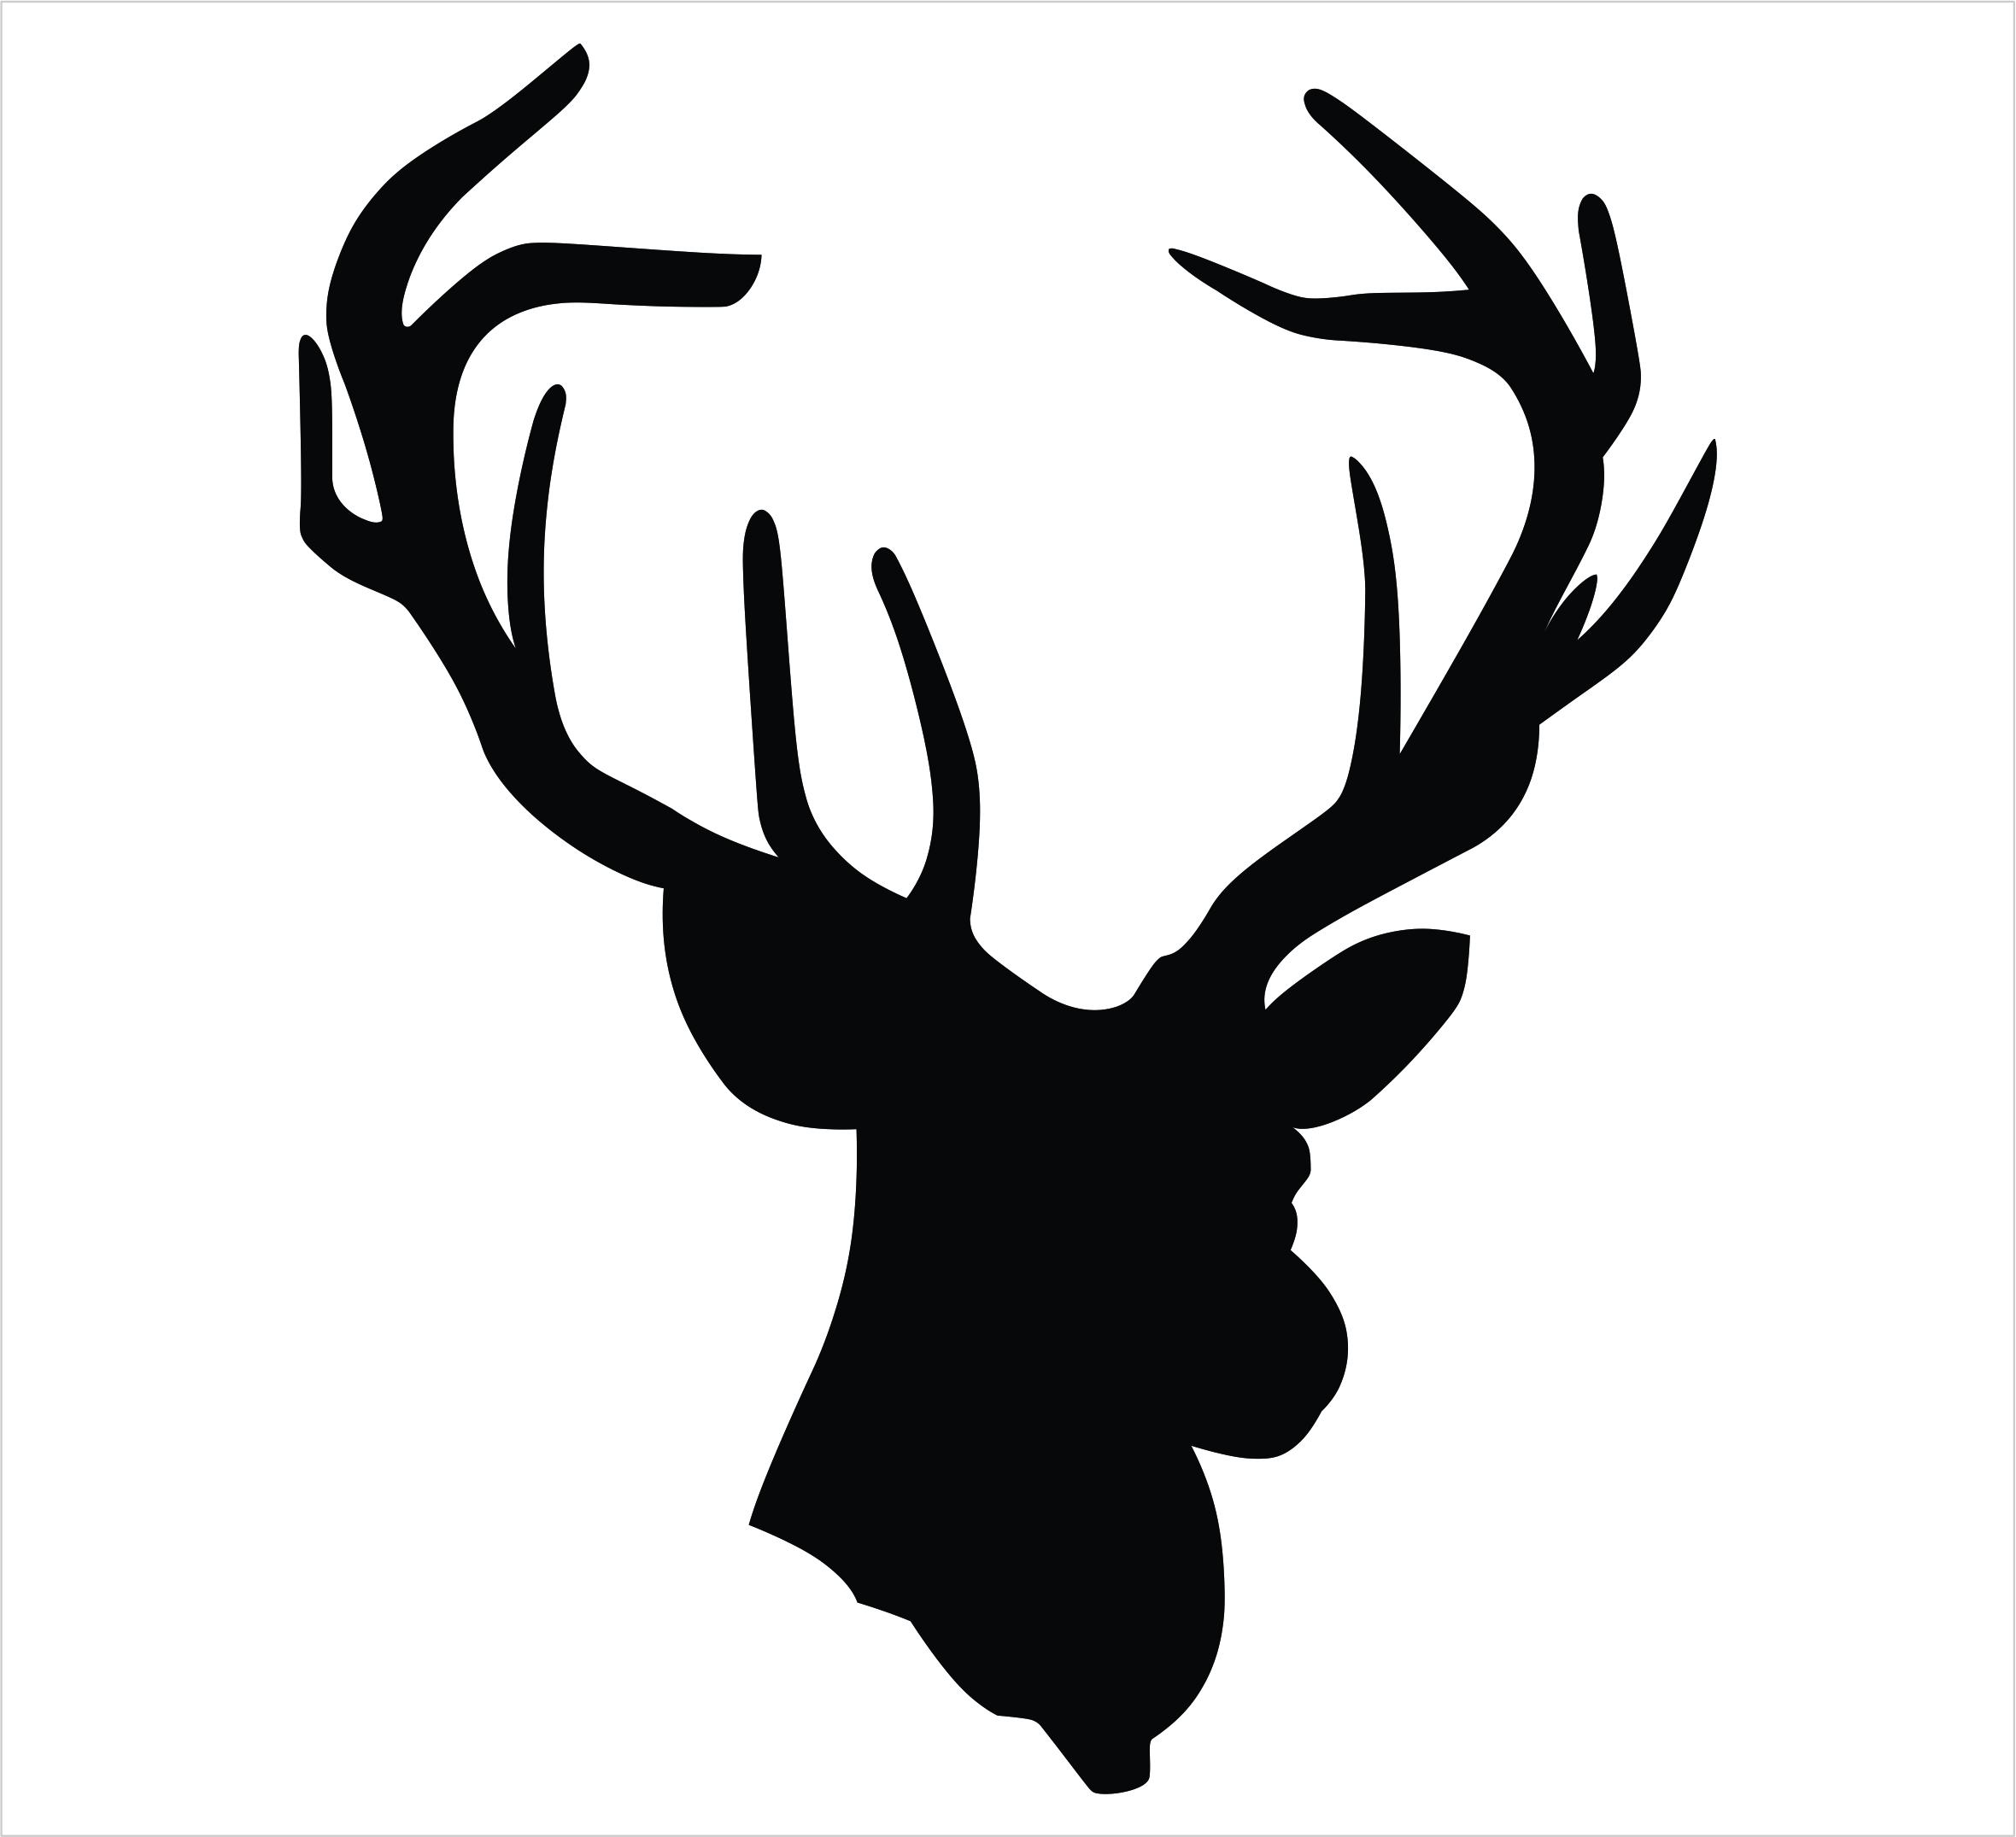 deer skull silhouette vector at getdrawings com free for personal rh getdrawings com deer skull with flowers clipart deer skull clip art graphics